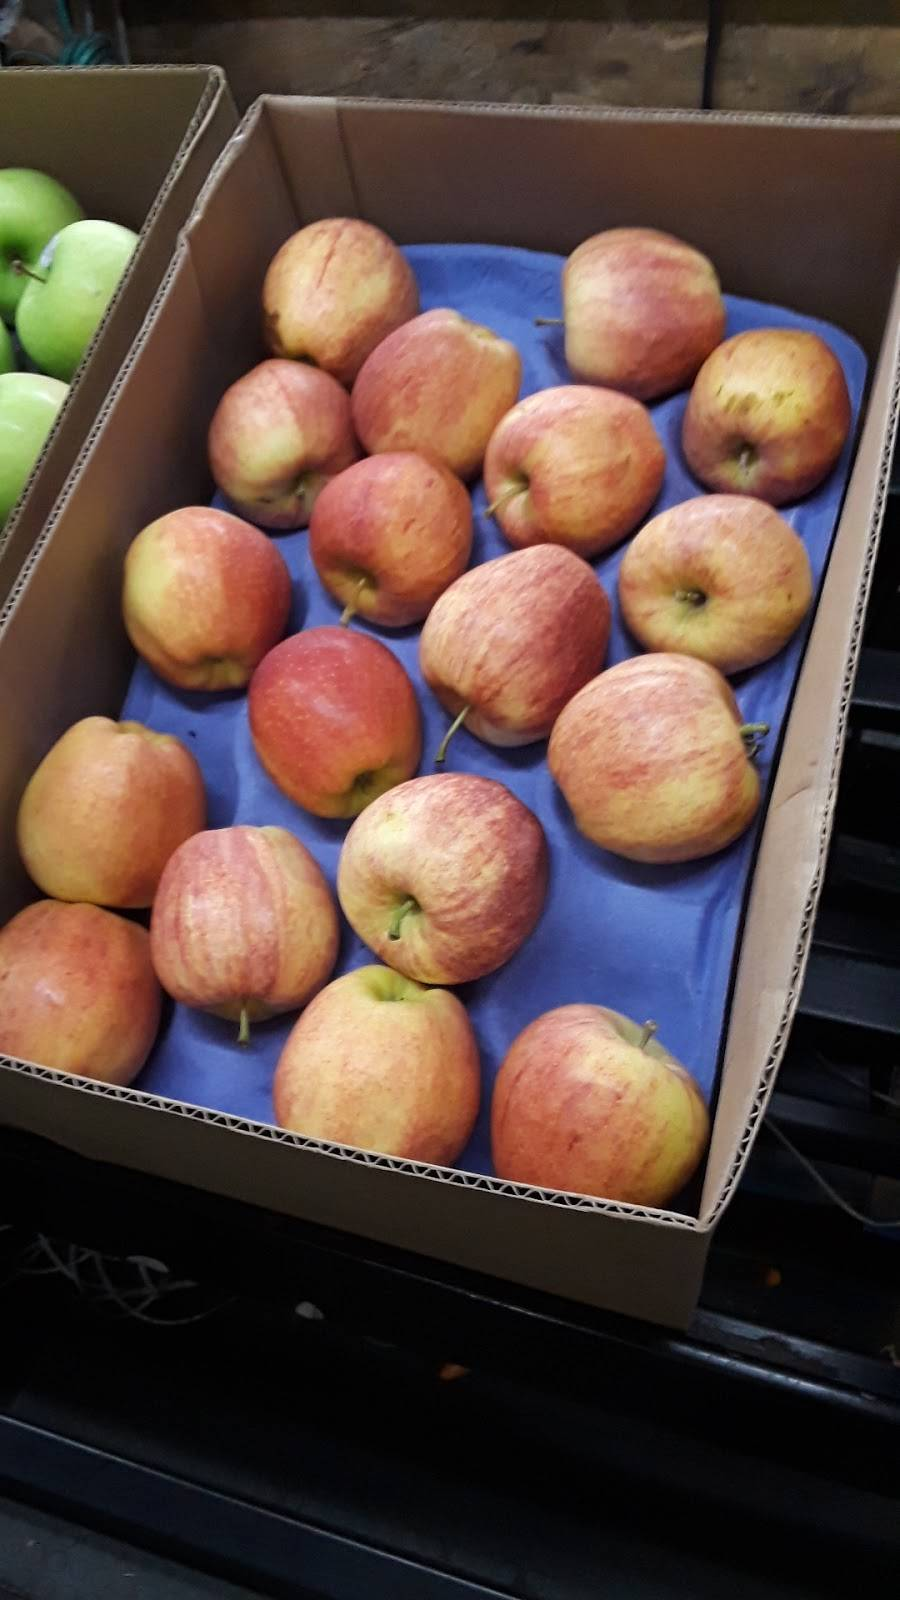 Jalisco Fresh Produce Inc - store  | Photo 4 of 8 | Address: 1601 E Olympic Blvd, Los Angeles, CA 90021, USA | Phone: (213) 629-0993